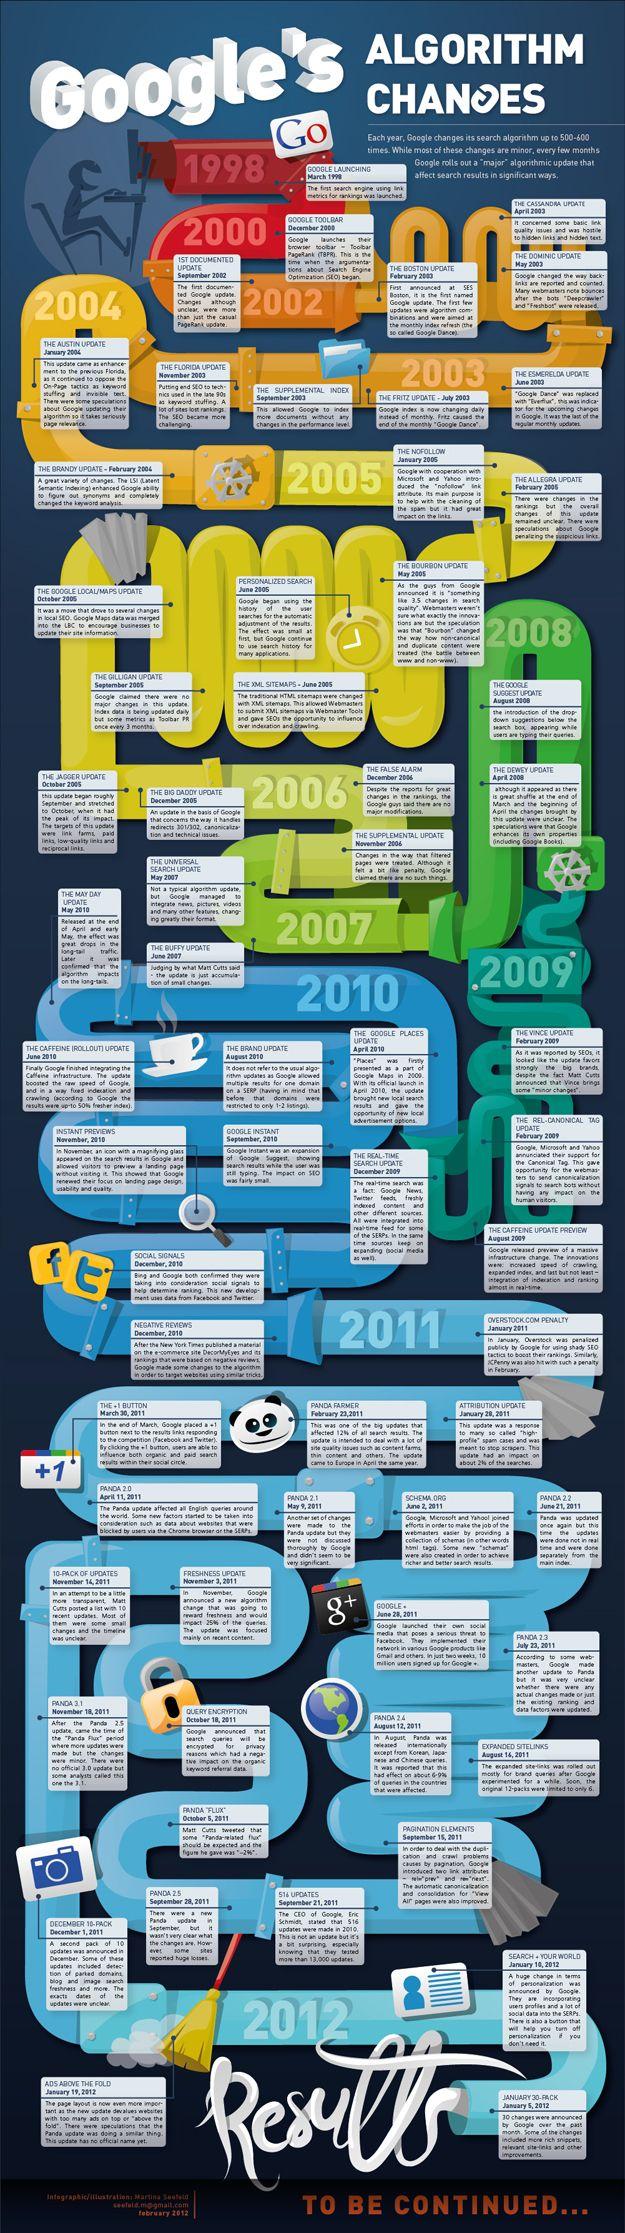 SEO: Google's Algorithm Changes [Infographic]